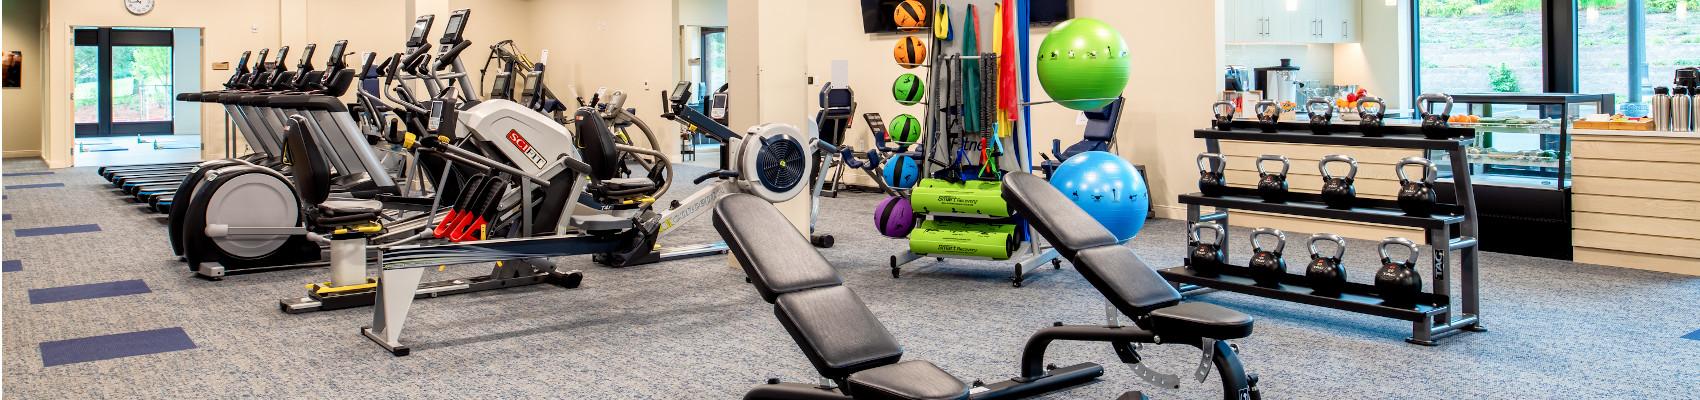 Fitness center inside Mary s Woods